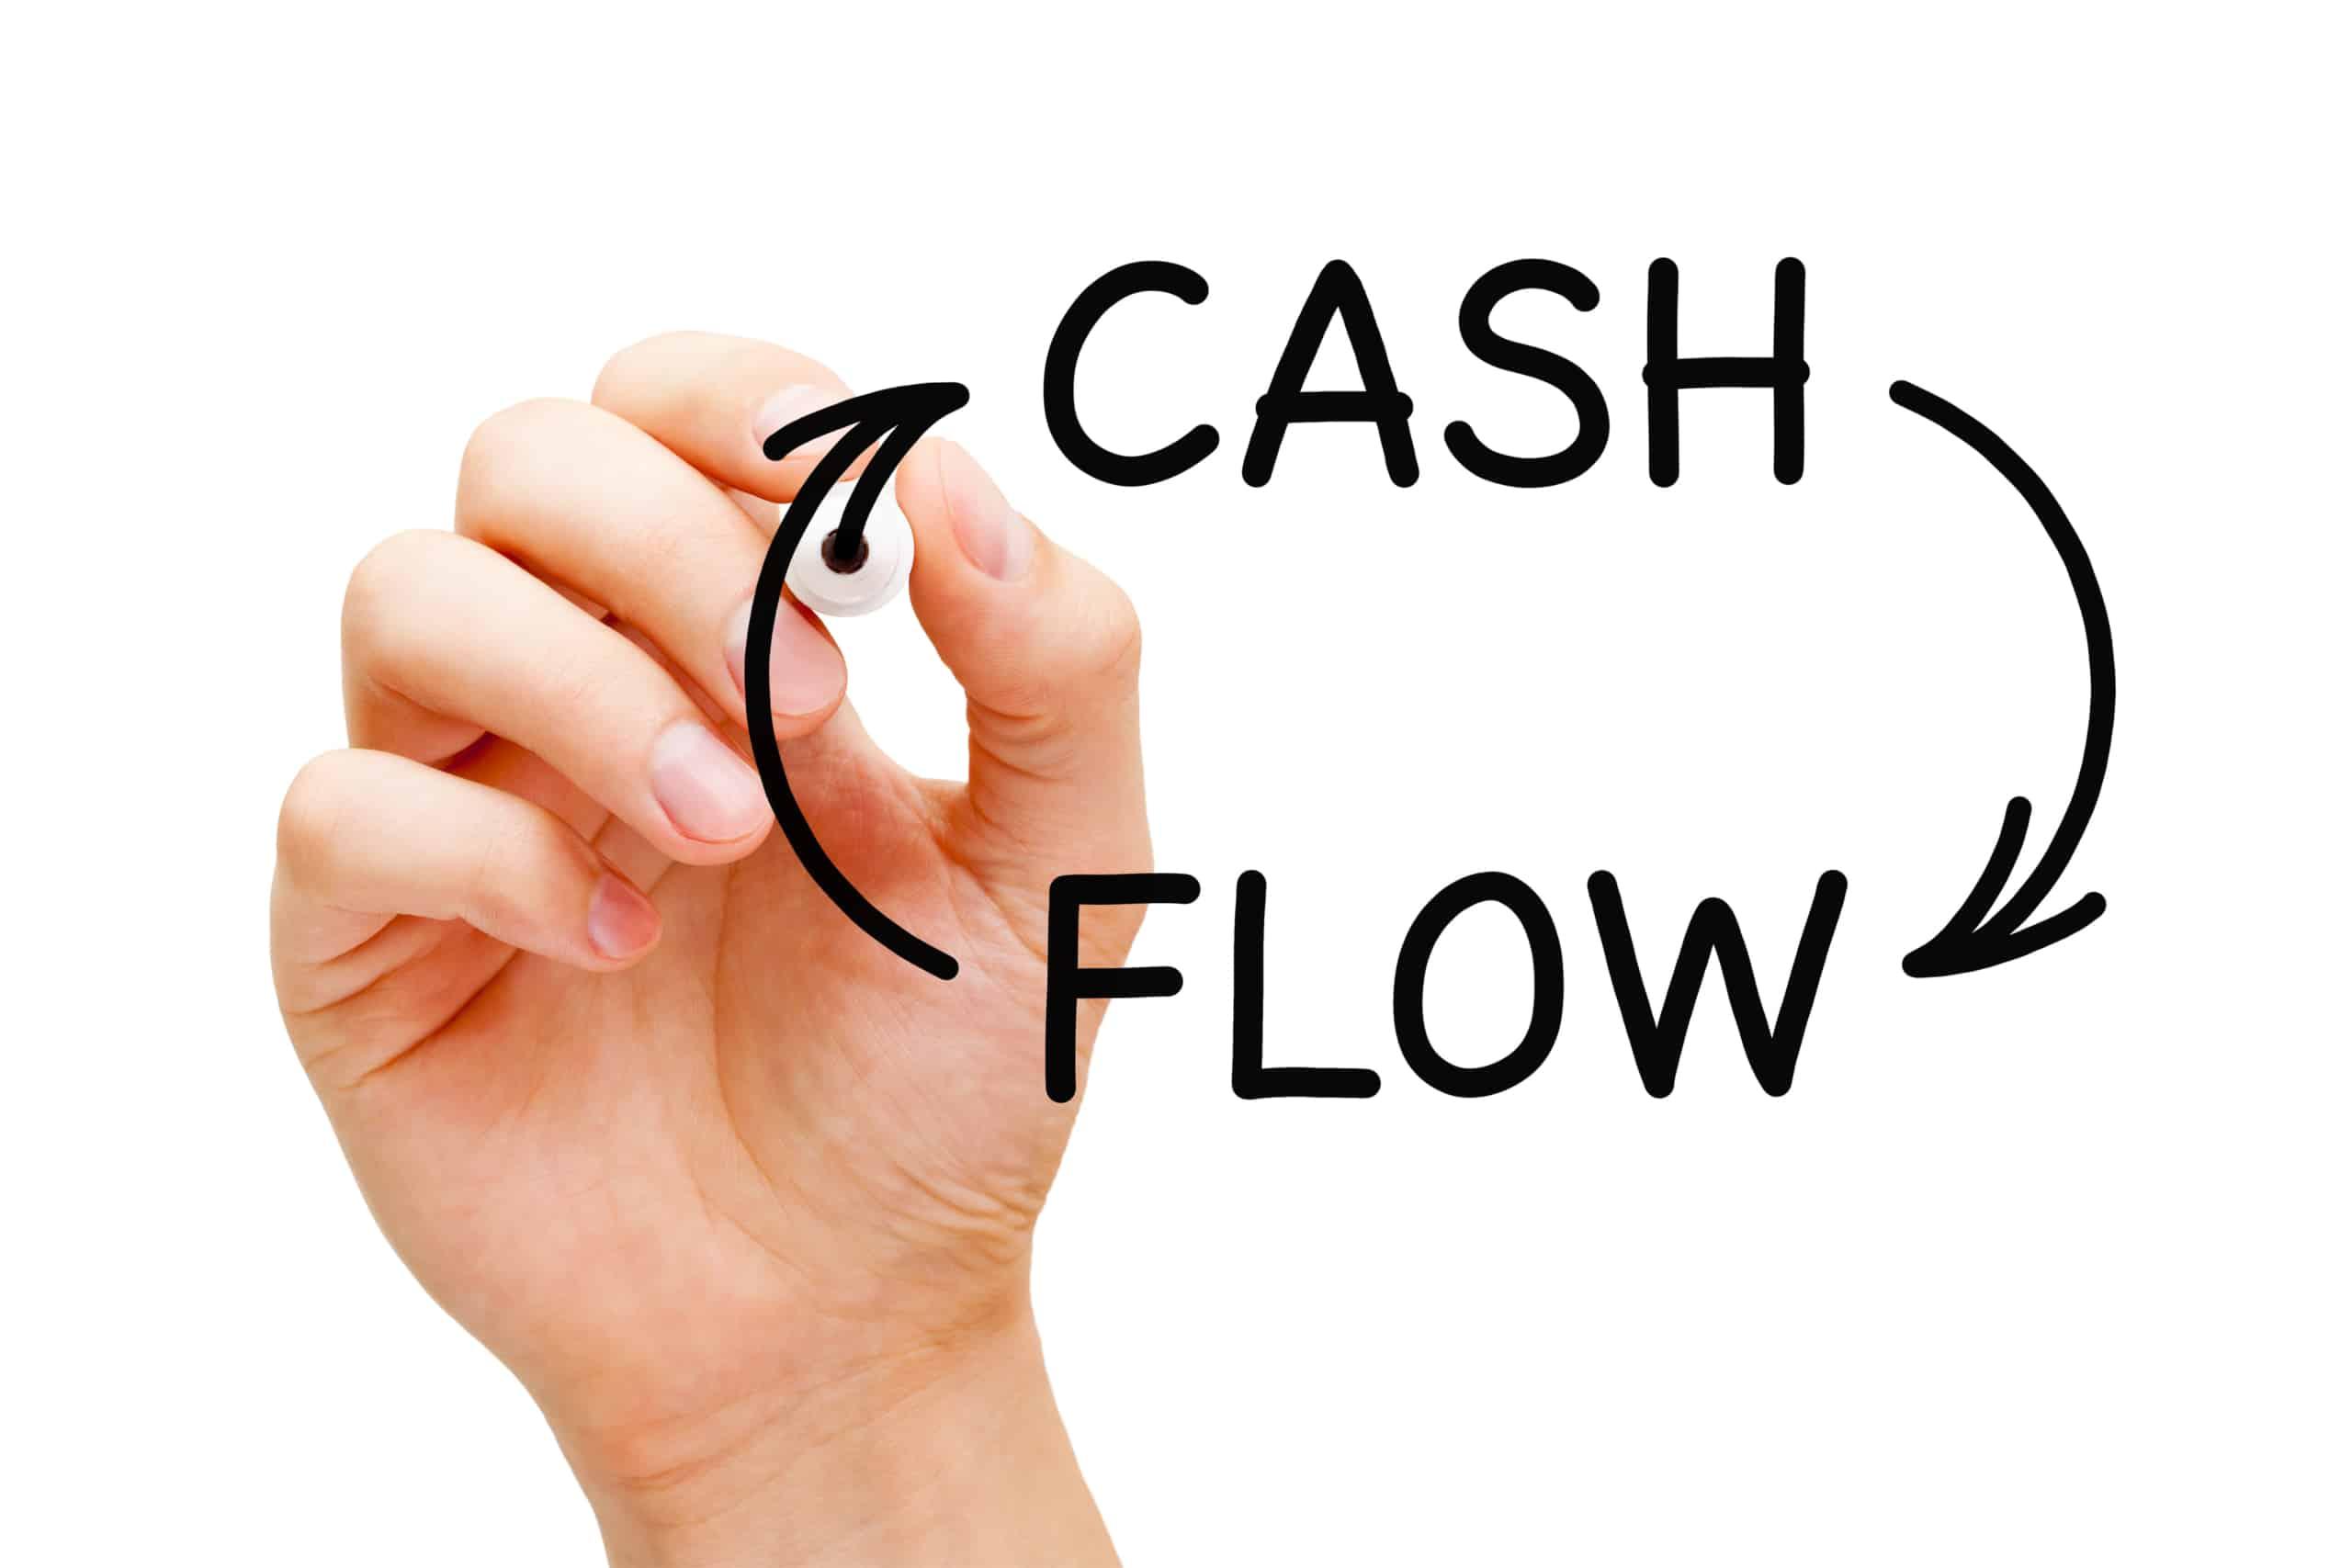 cash flow written out